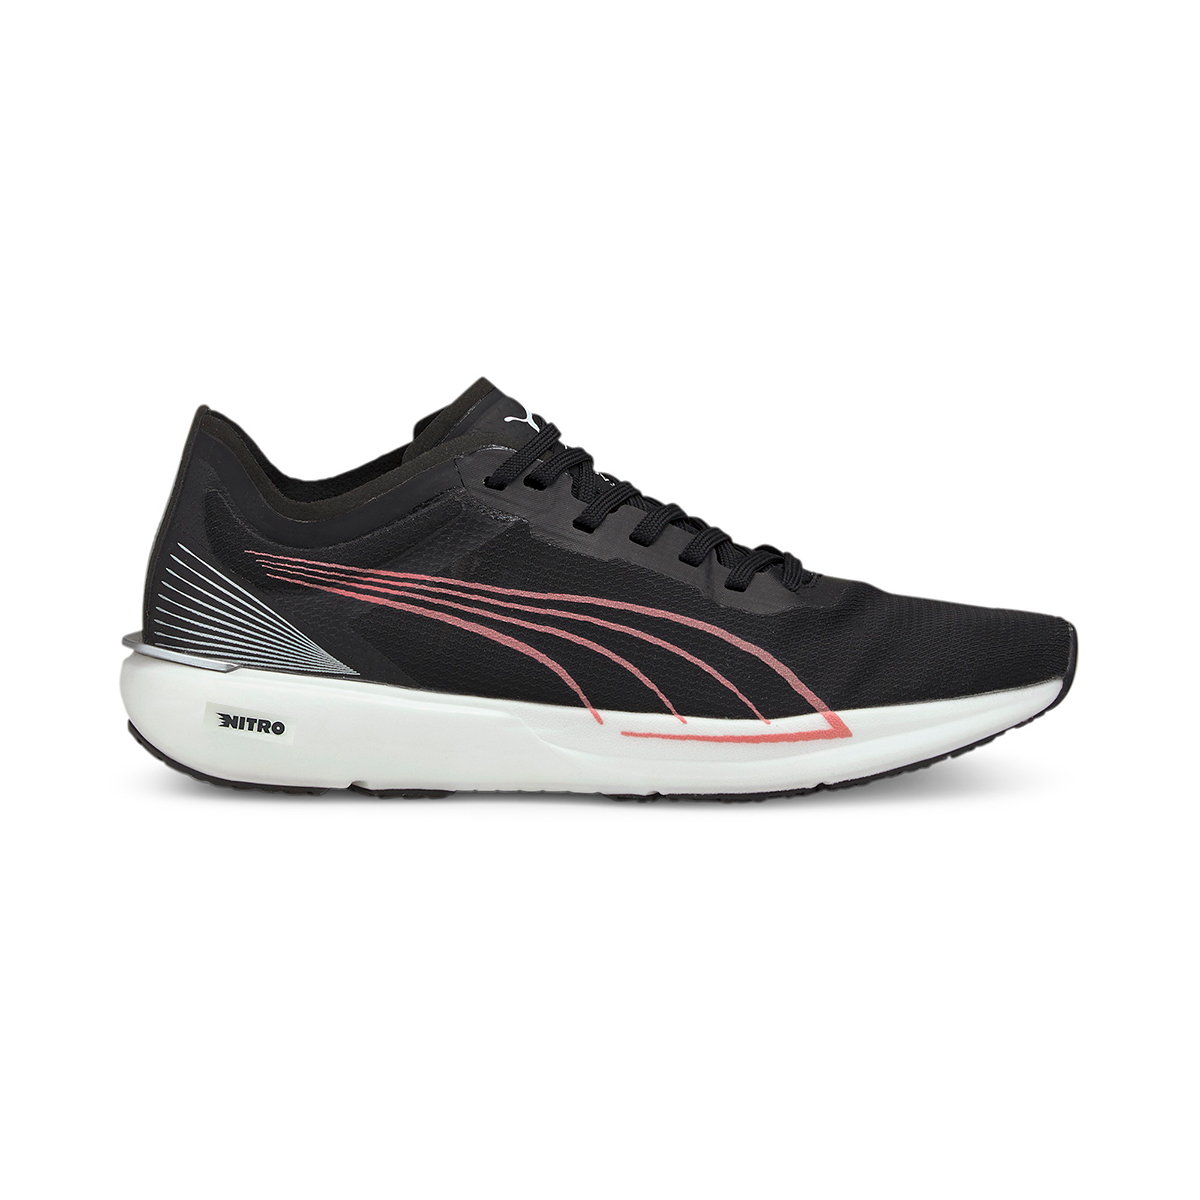 Women's Puma Liberate Nitro Running Shoe - Color: Puma Black - Size: 5.5 - Width: Regular, Puma Black, large, image 1